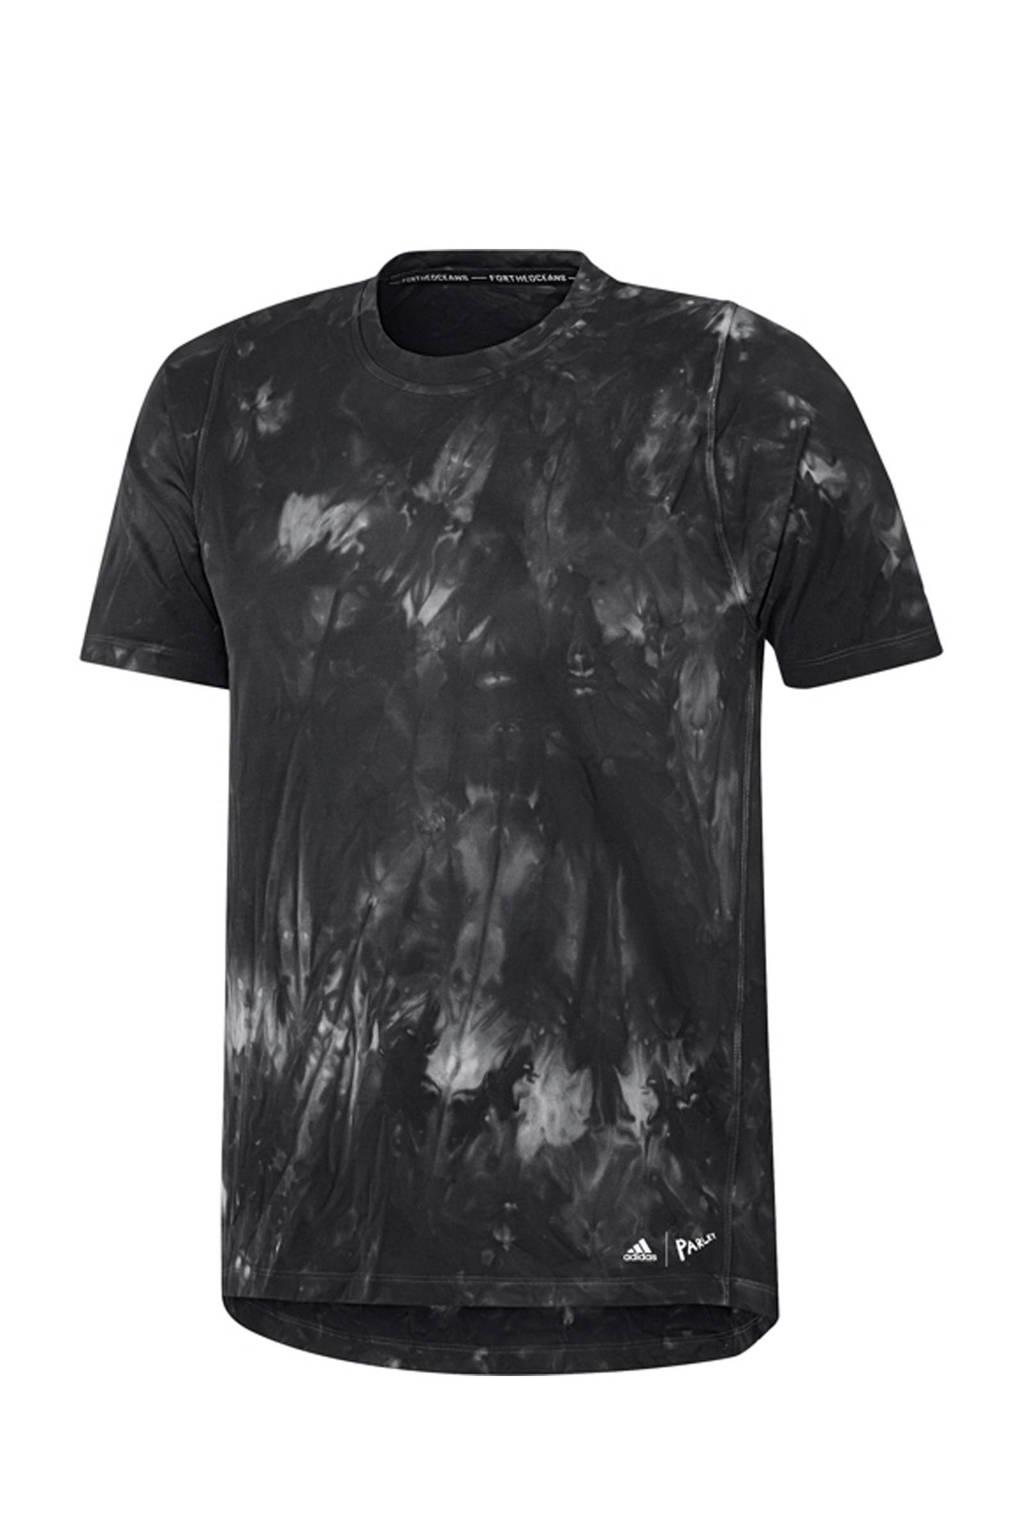 adidas   Parley sport T-shirt antraciet, Antraciet